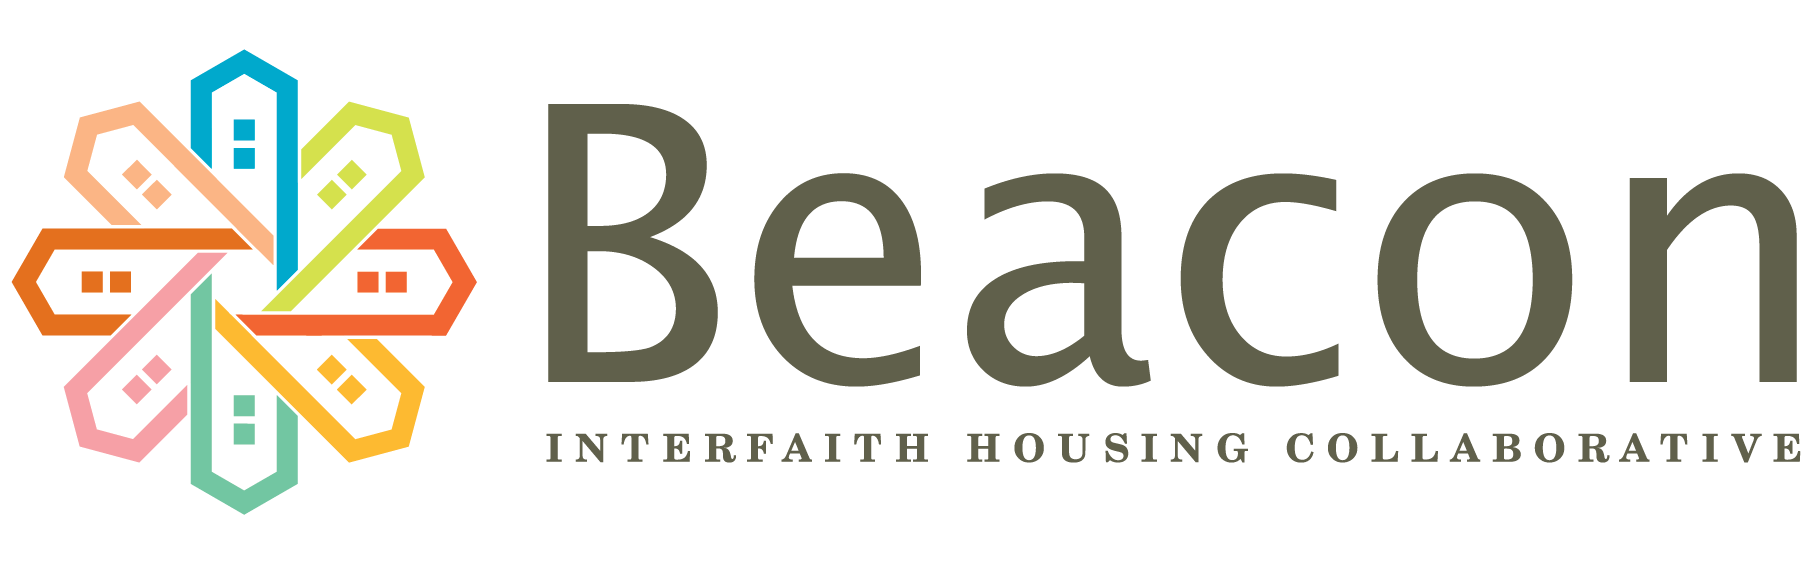 Beacon_ logo horizontal trans - trimmed.png